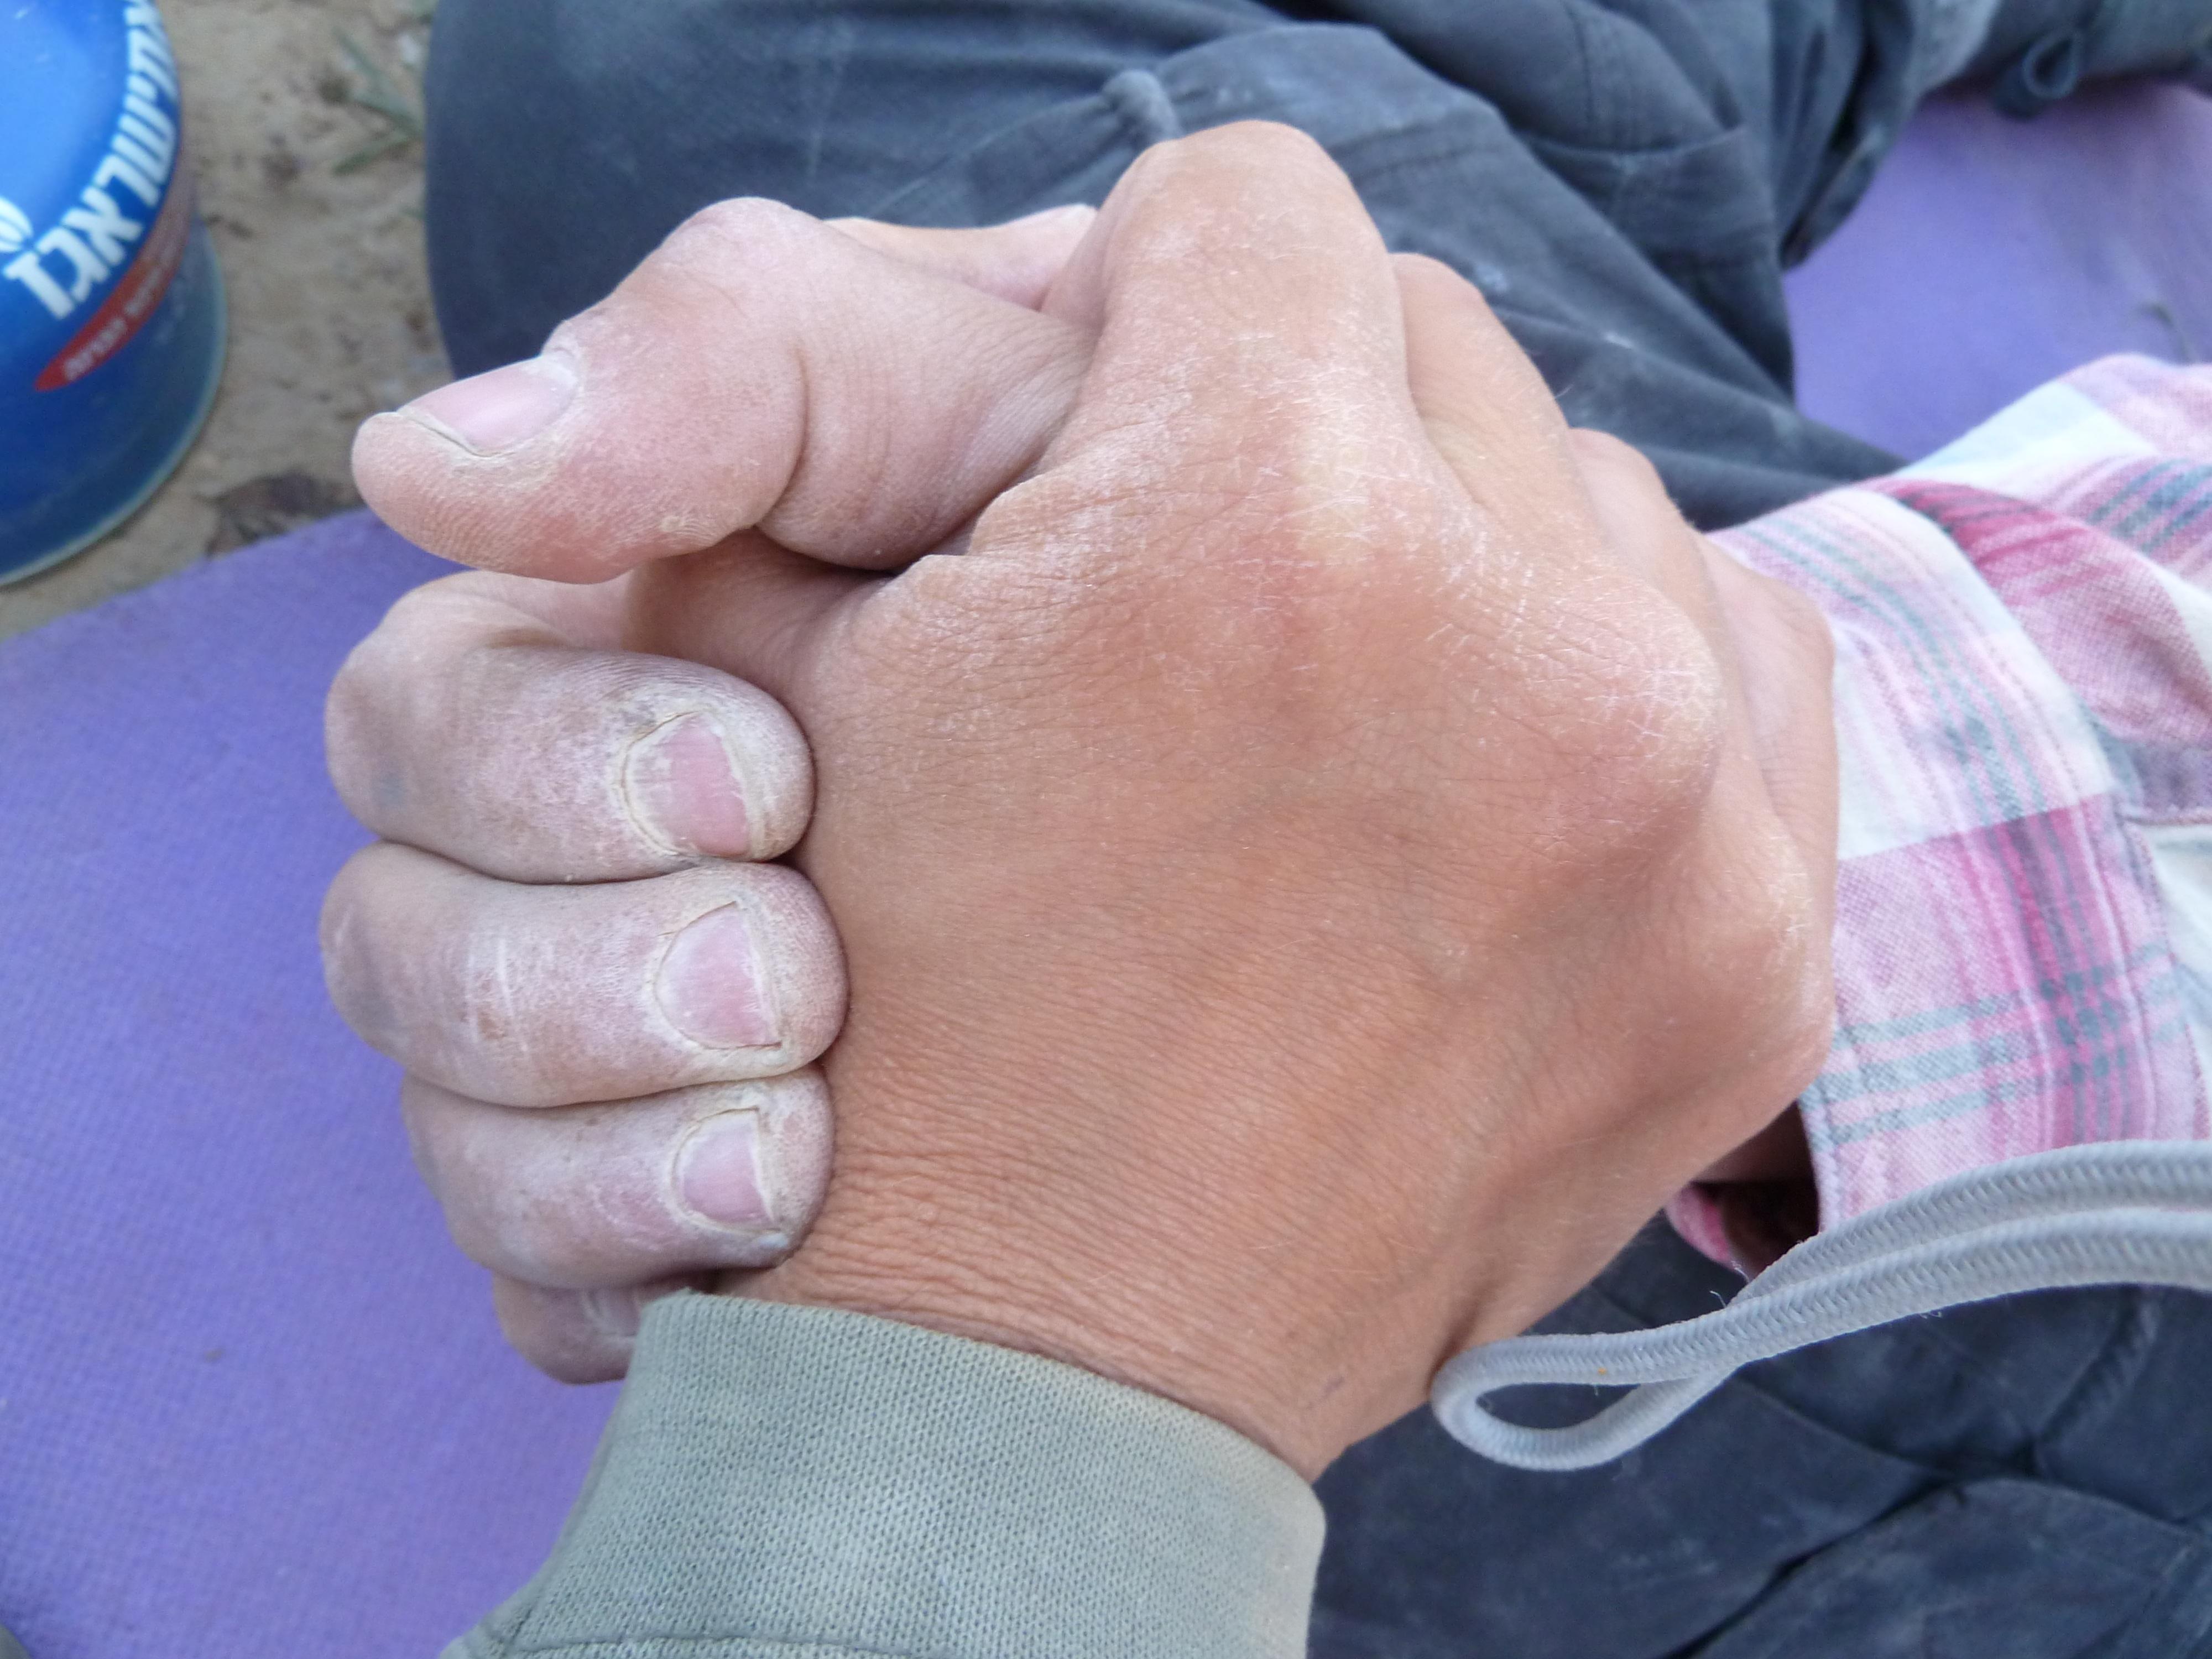 Free Images : hand, leg, finger, hike, foot, dust, friendship ...